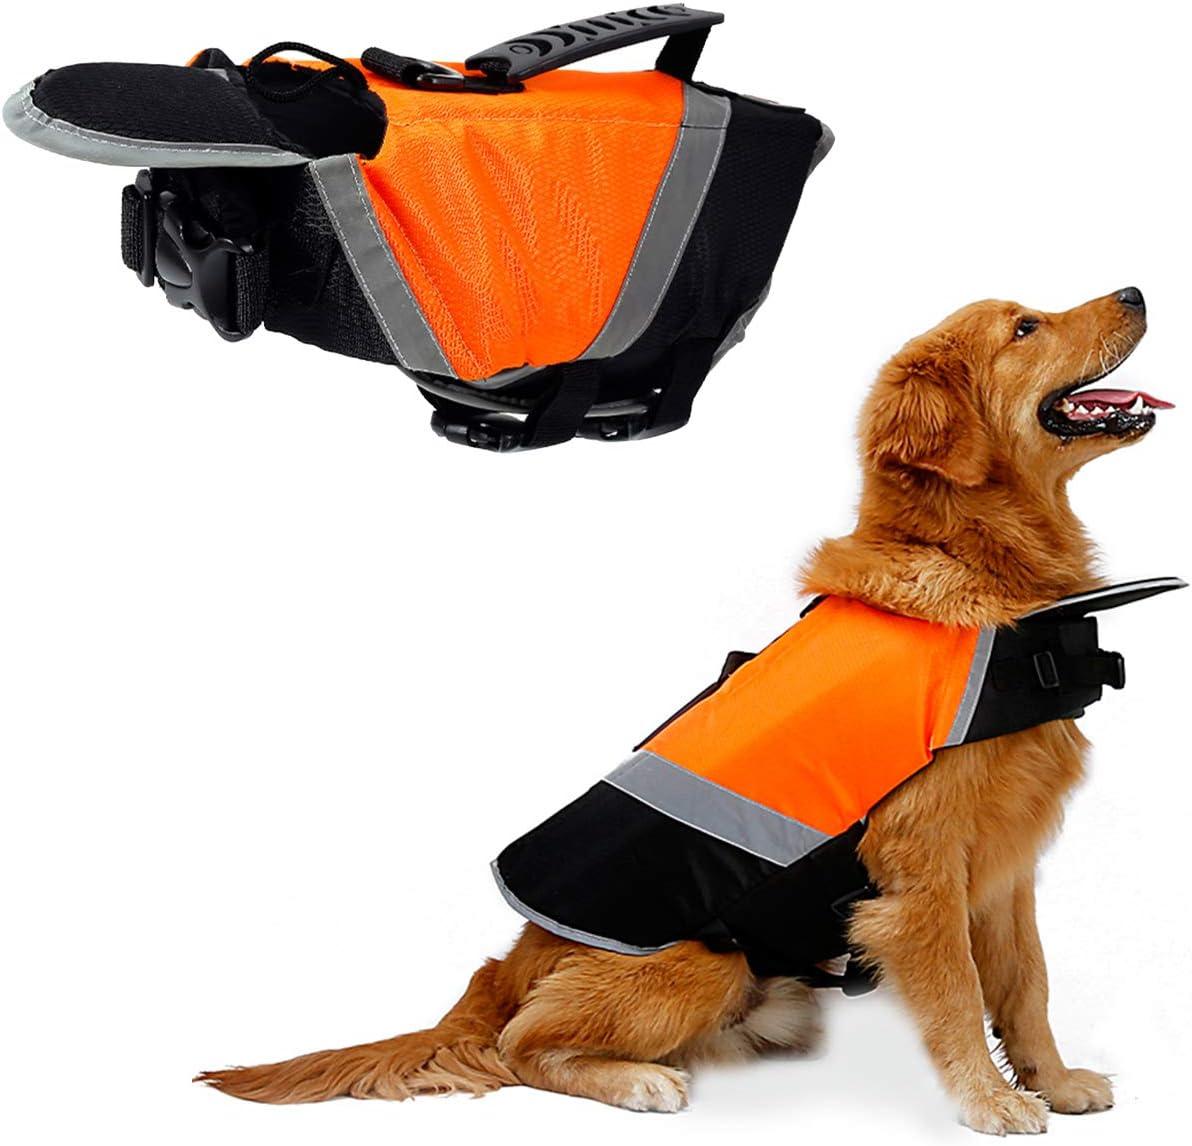 XS Vivaglory Dog Life Jackets Pet Life Vest Lifesaver Dog Life Preserver with Extra Padding for Dogs Bright Orange